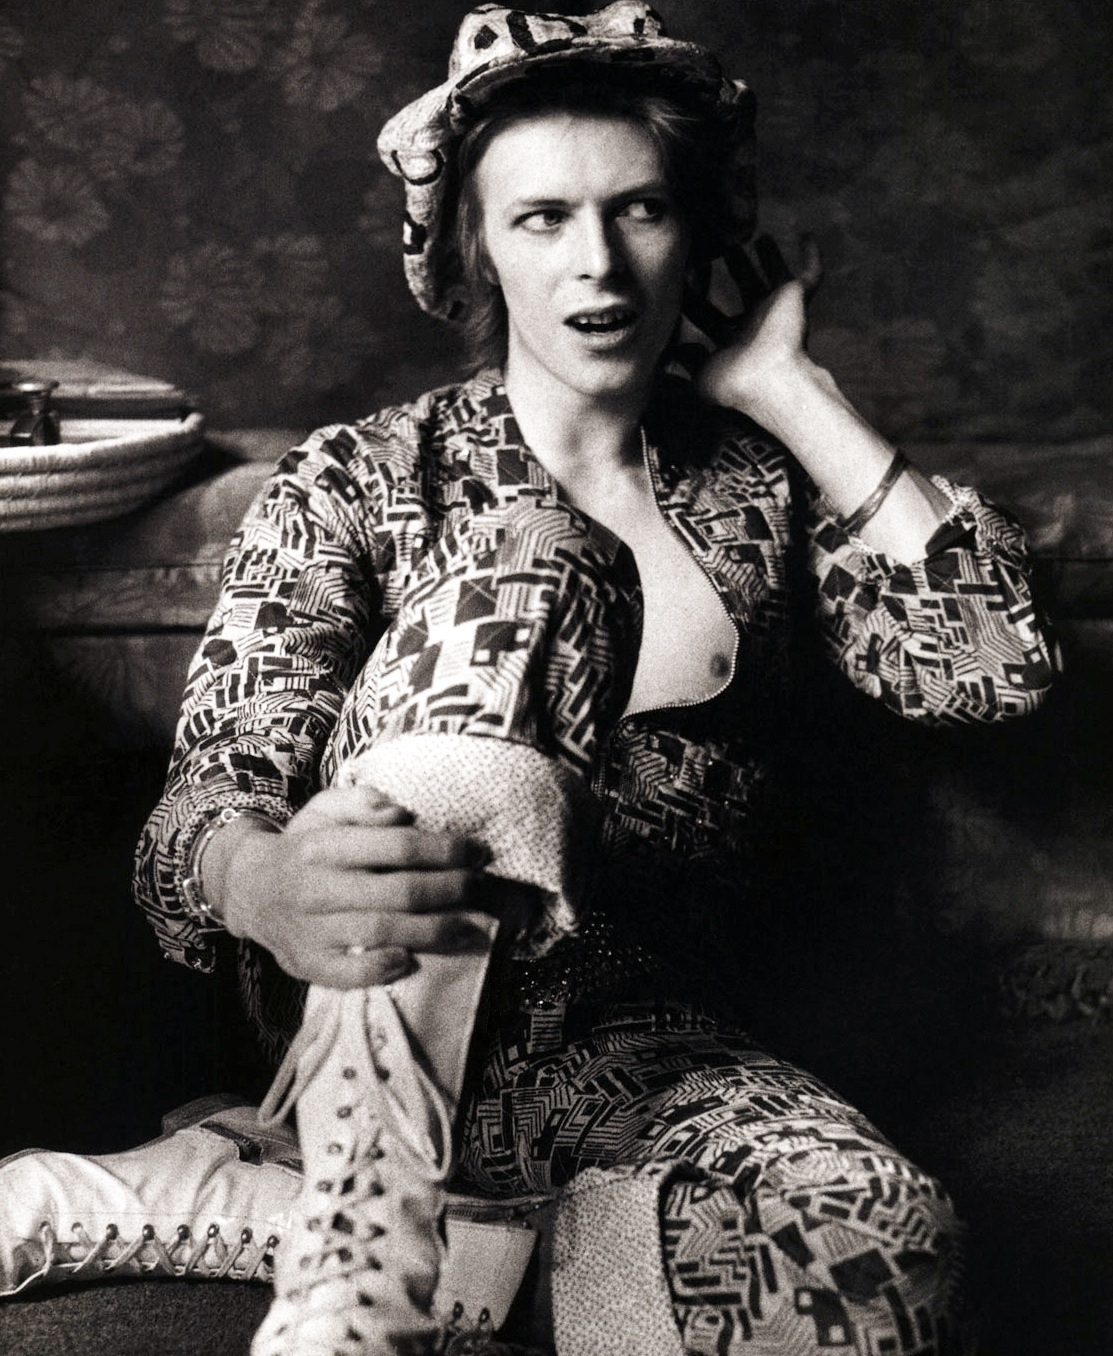 David_Bowie-Michael_Putland-1971.jpeg